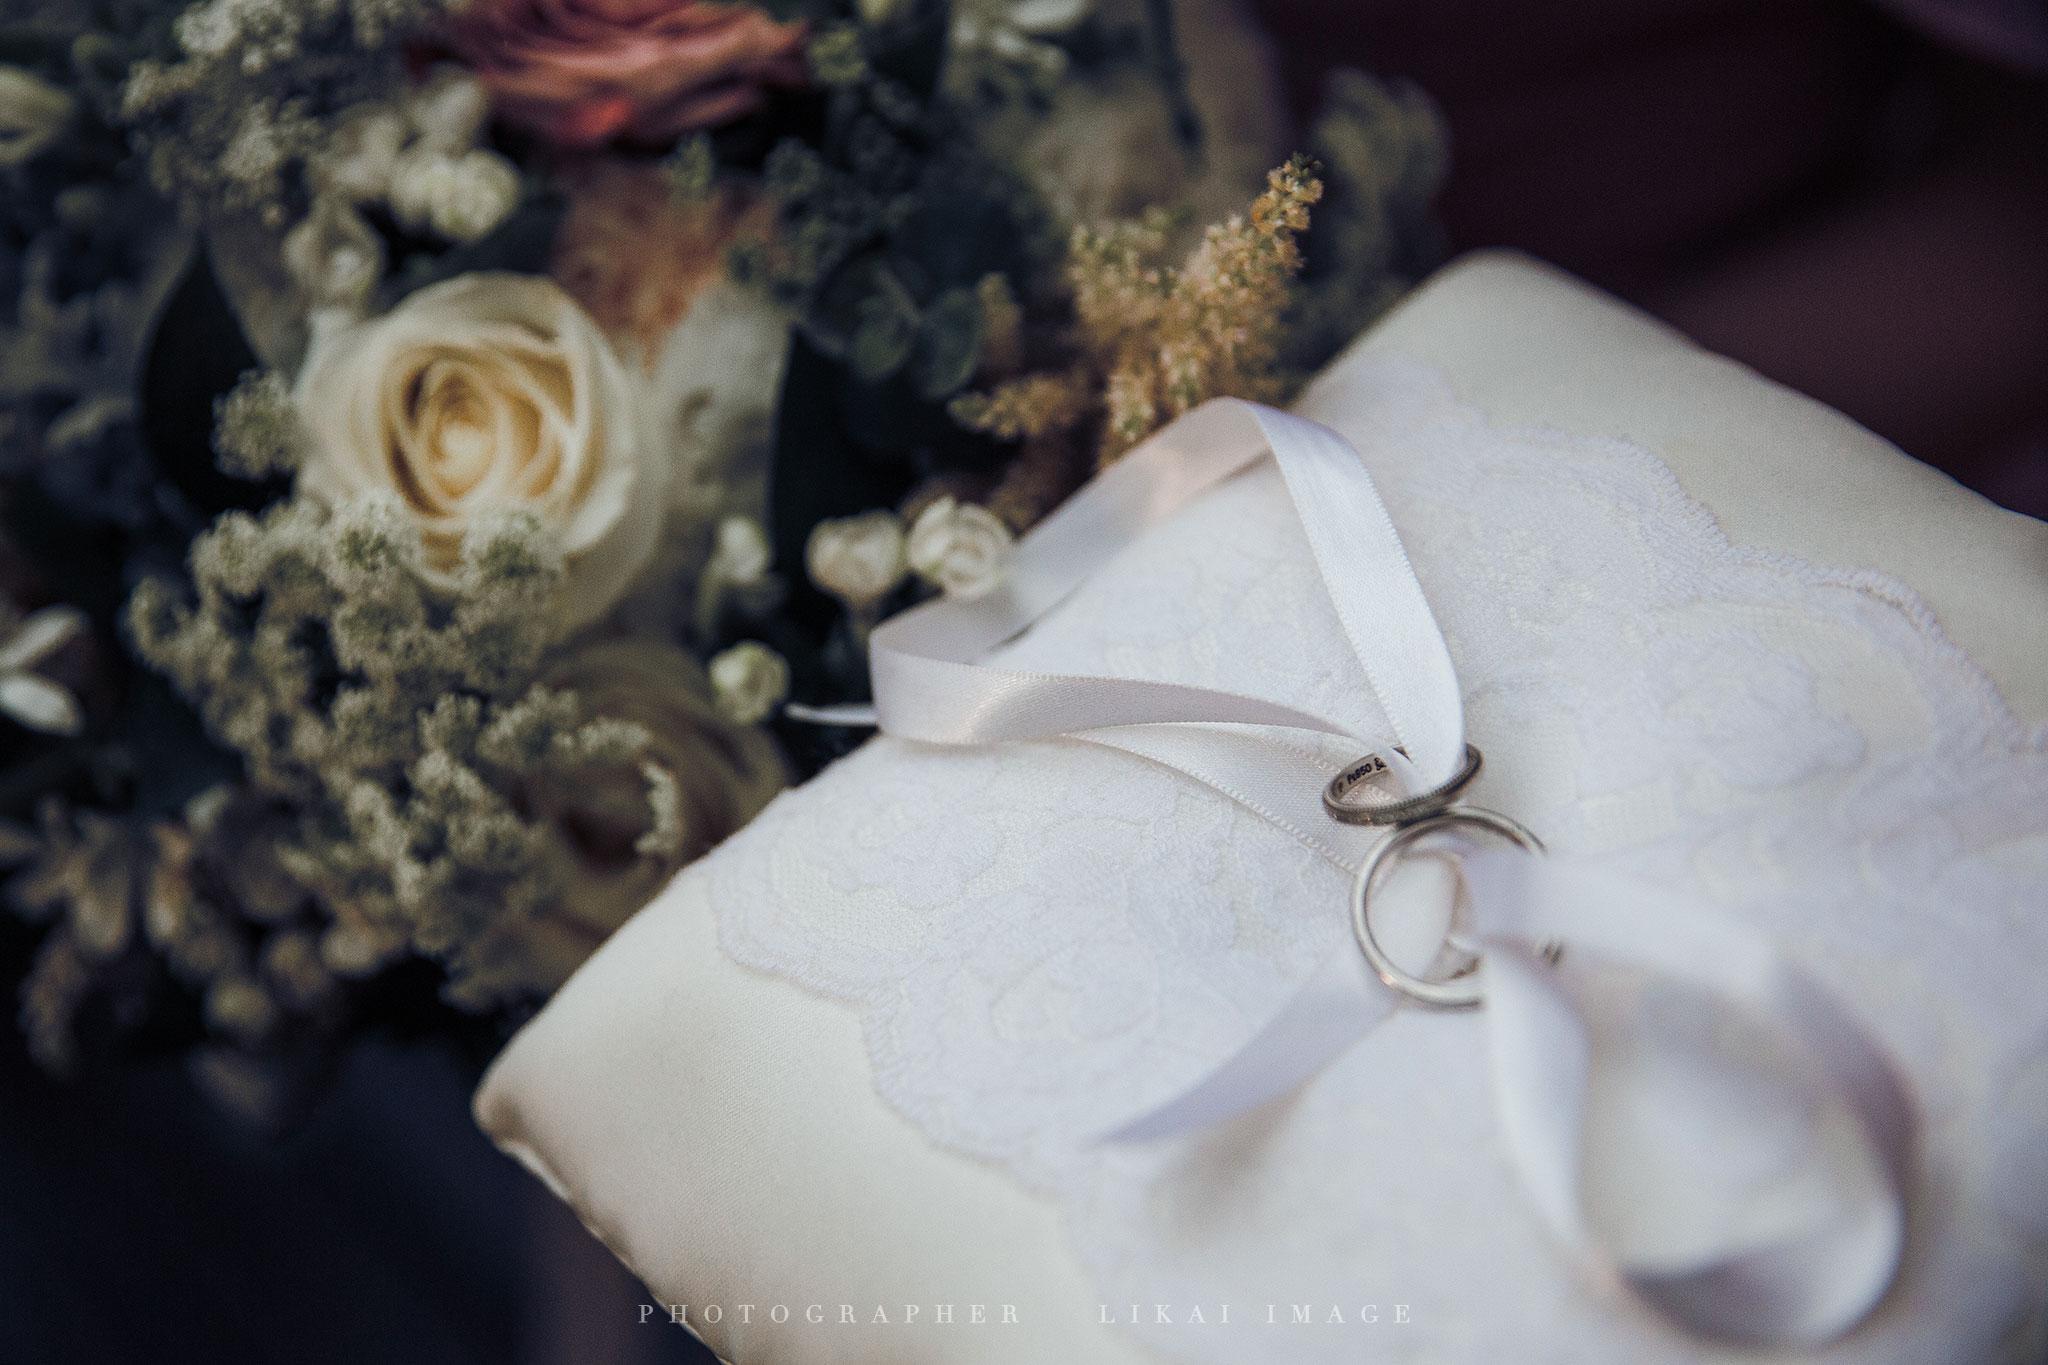 婚禮紀錄 - Vicky & Dehua - 烏來La Villa